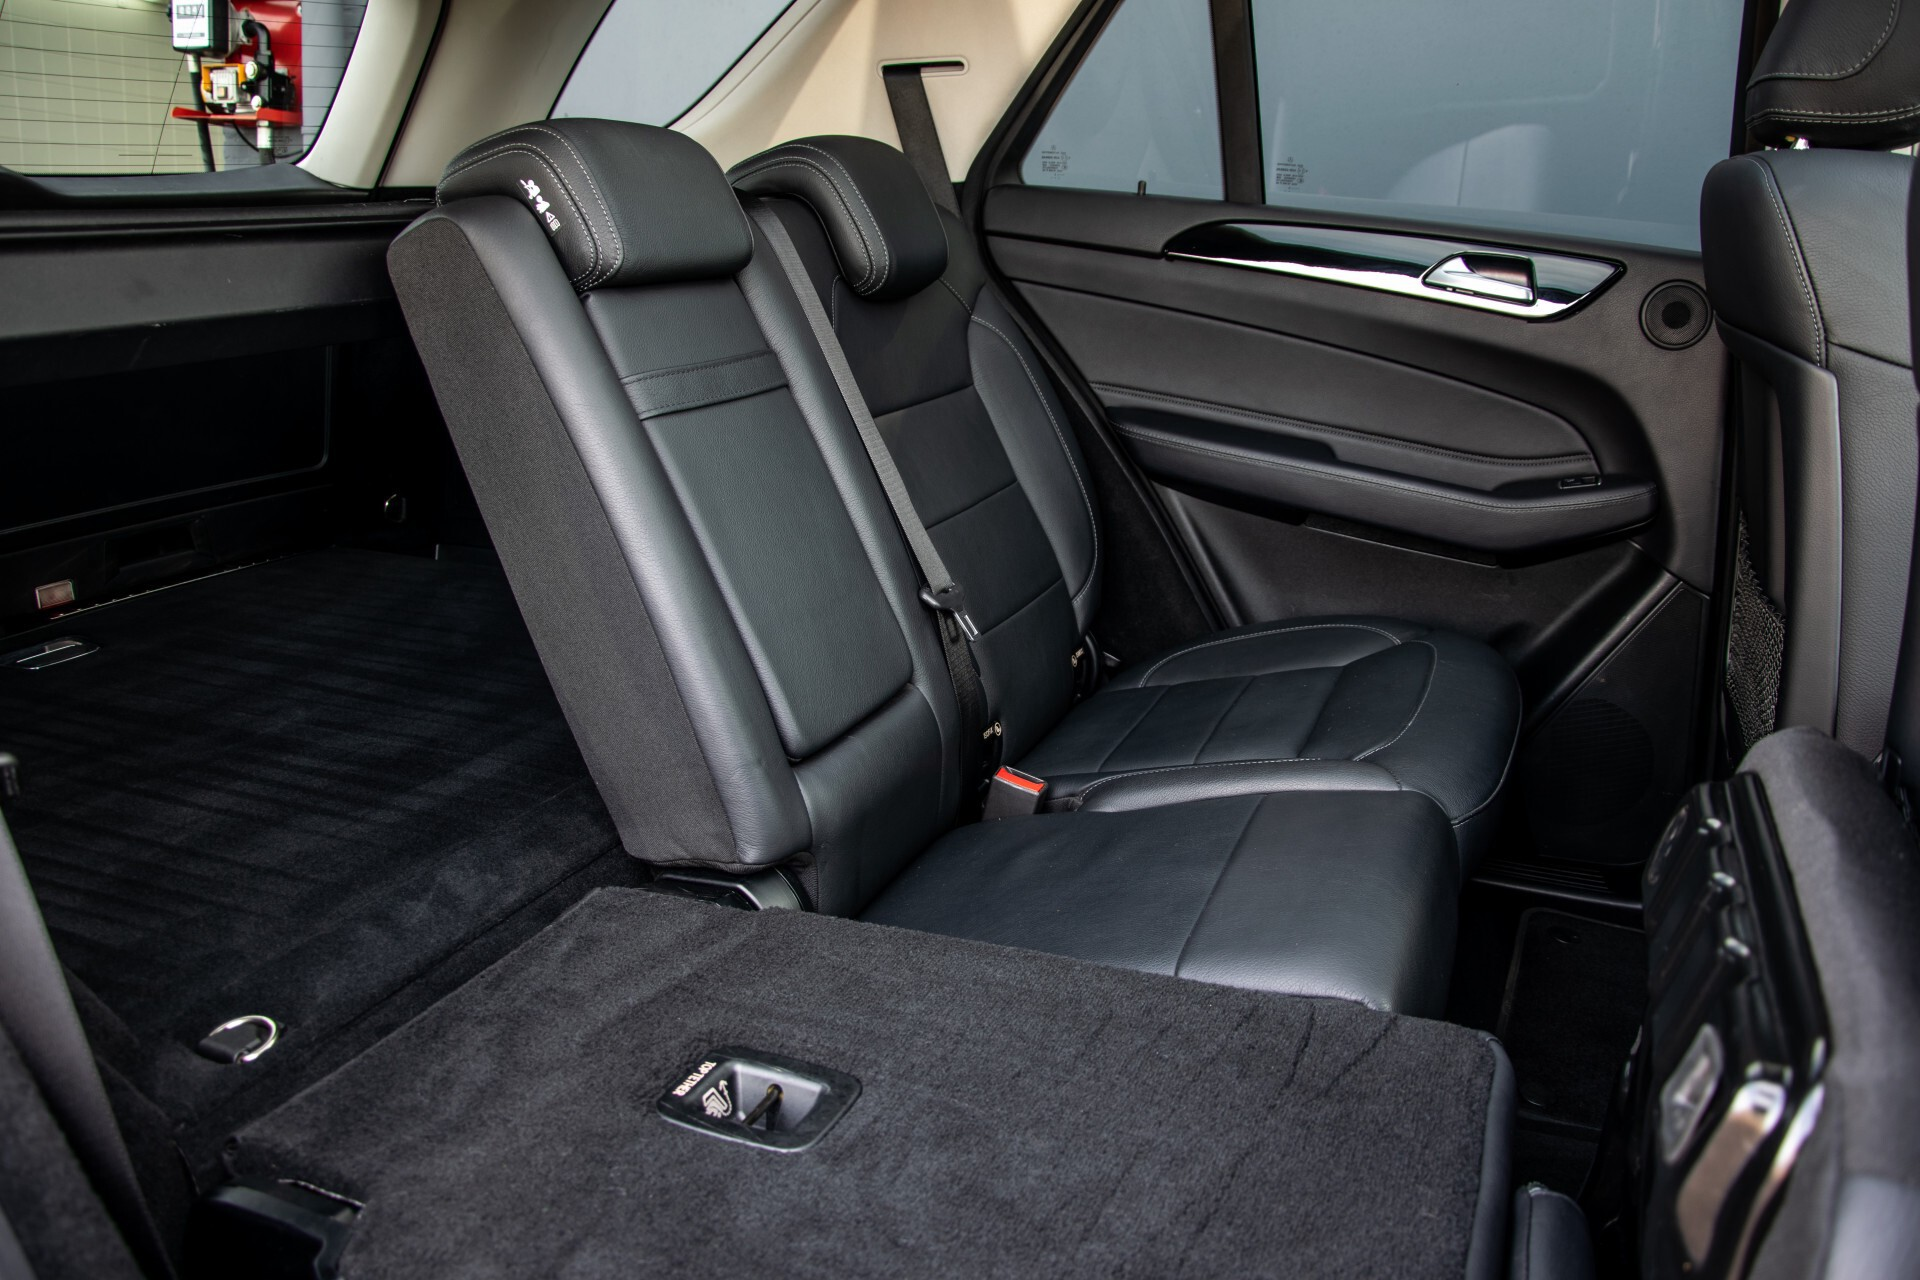 Mercedes-Benz GLE 350 d 4-M AMG Active Curve System/Panorama/Standkachel/Harman-Kardon/Trekhaak Aut9 Foto 6